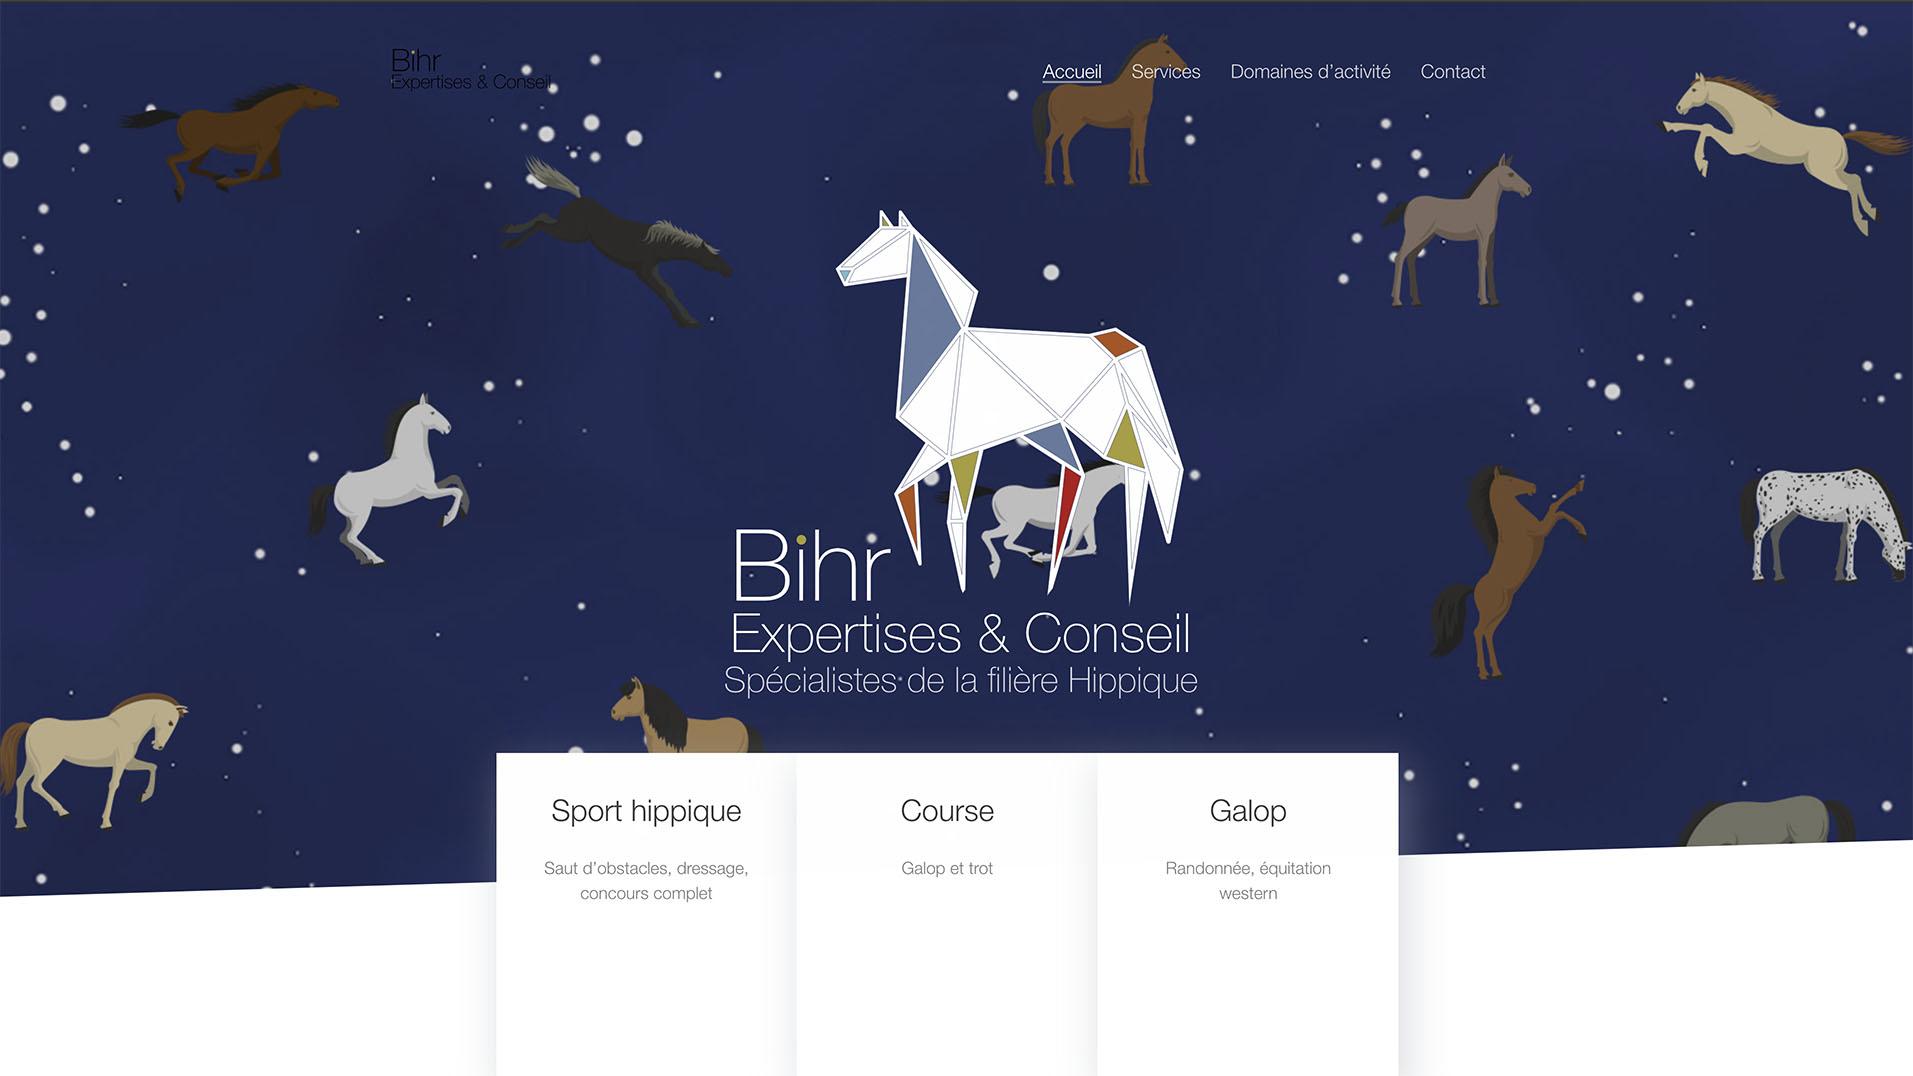 site internet Bihr Expertises & Conseil.